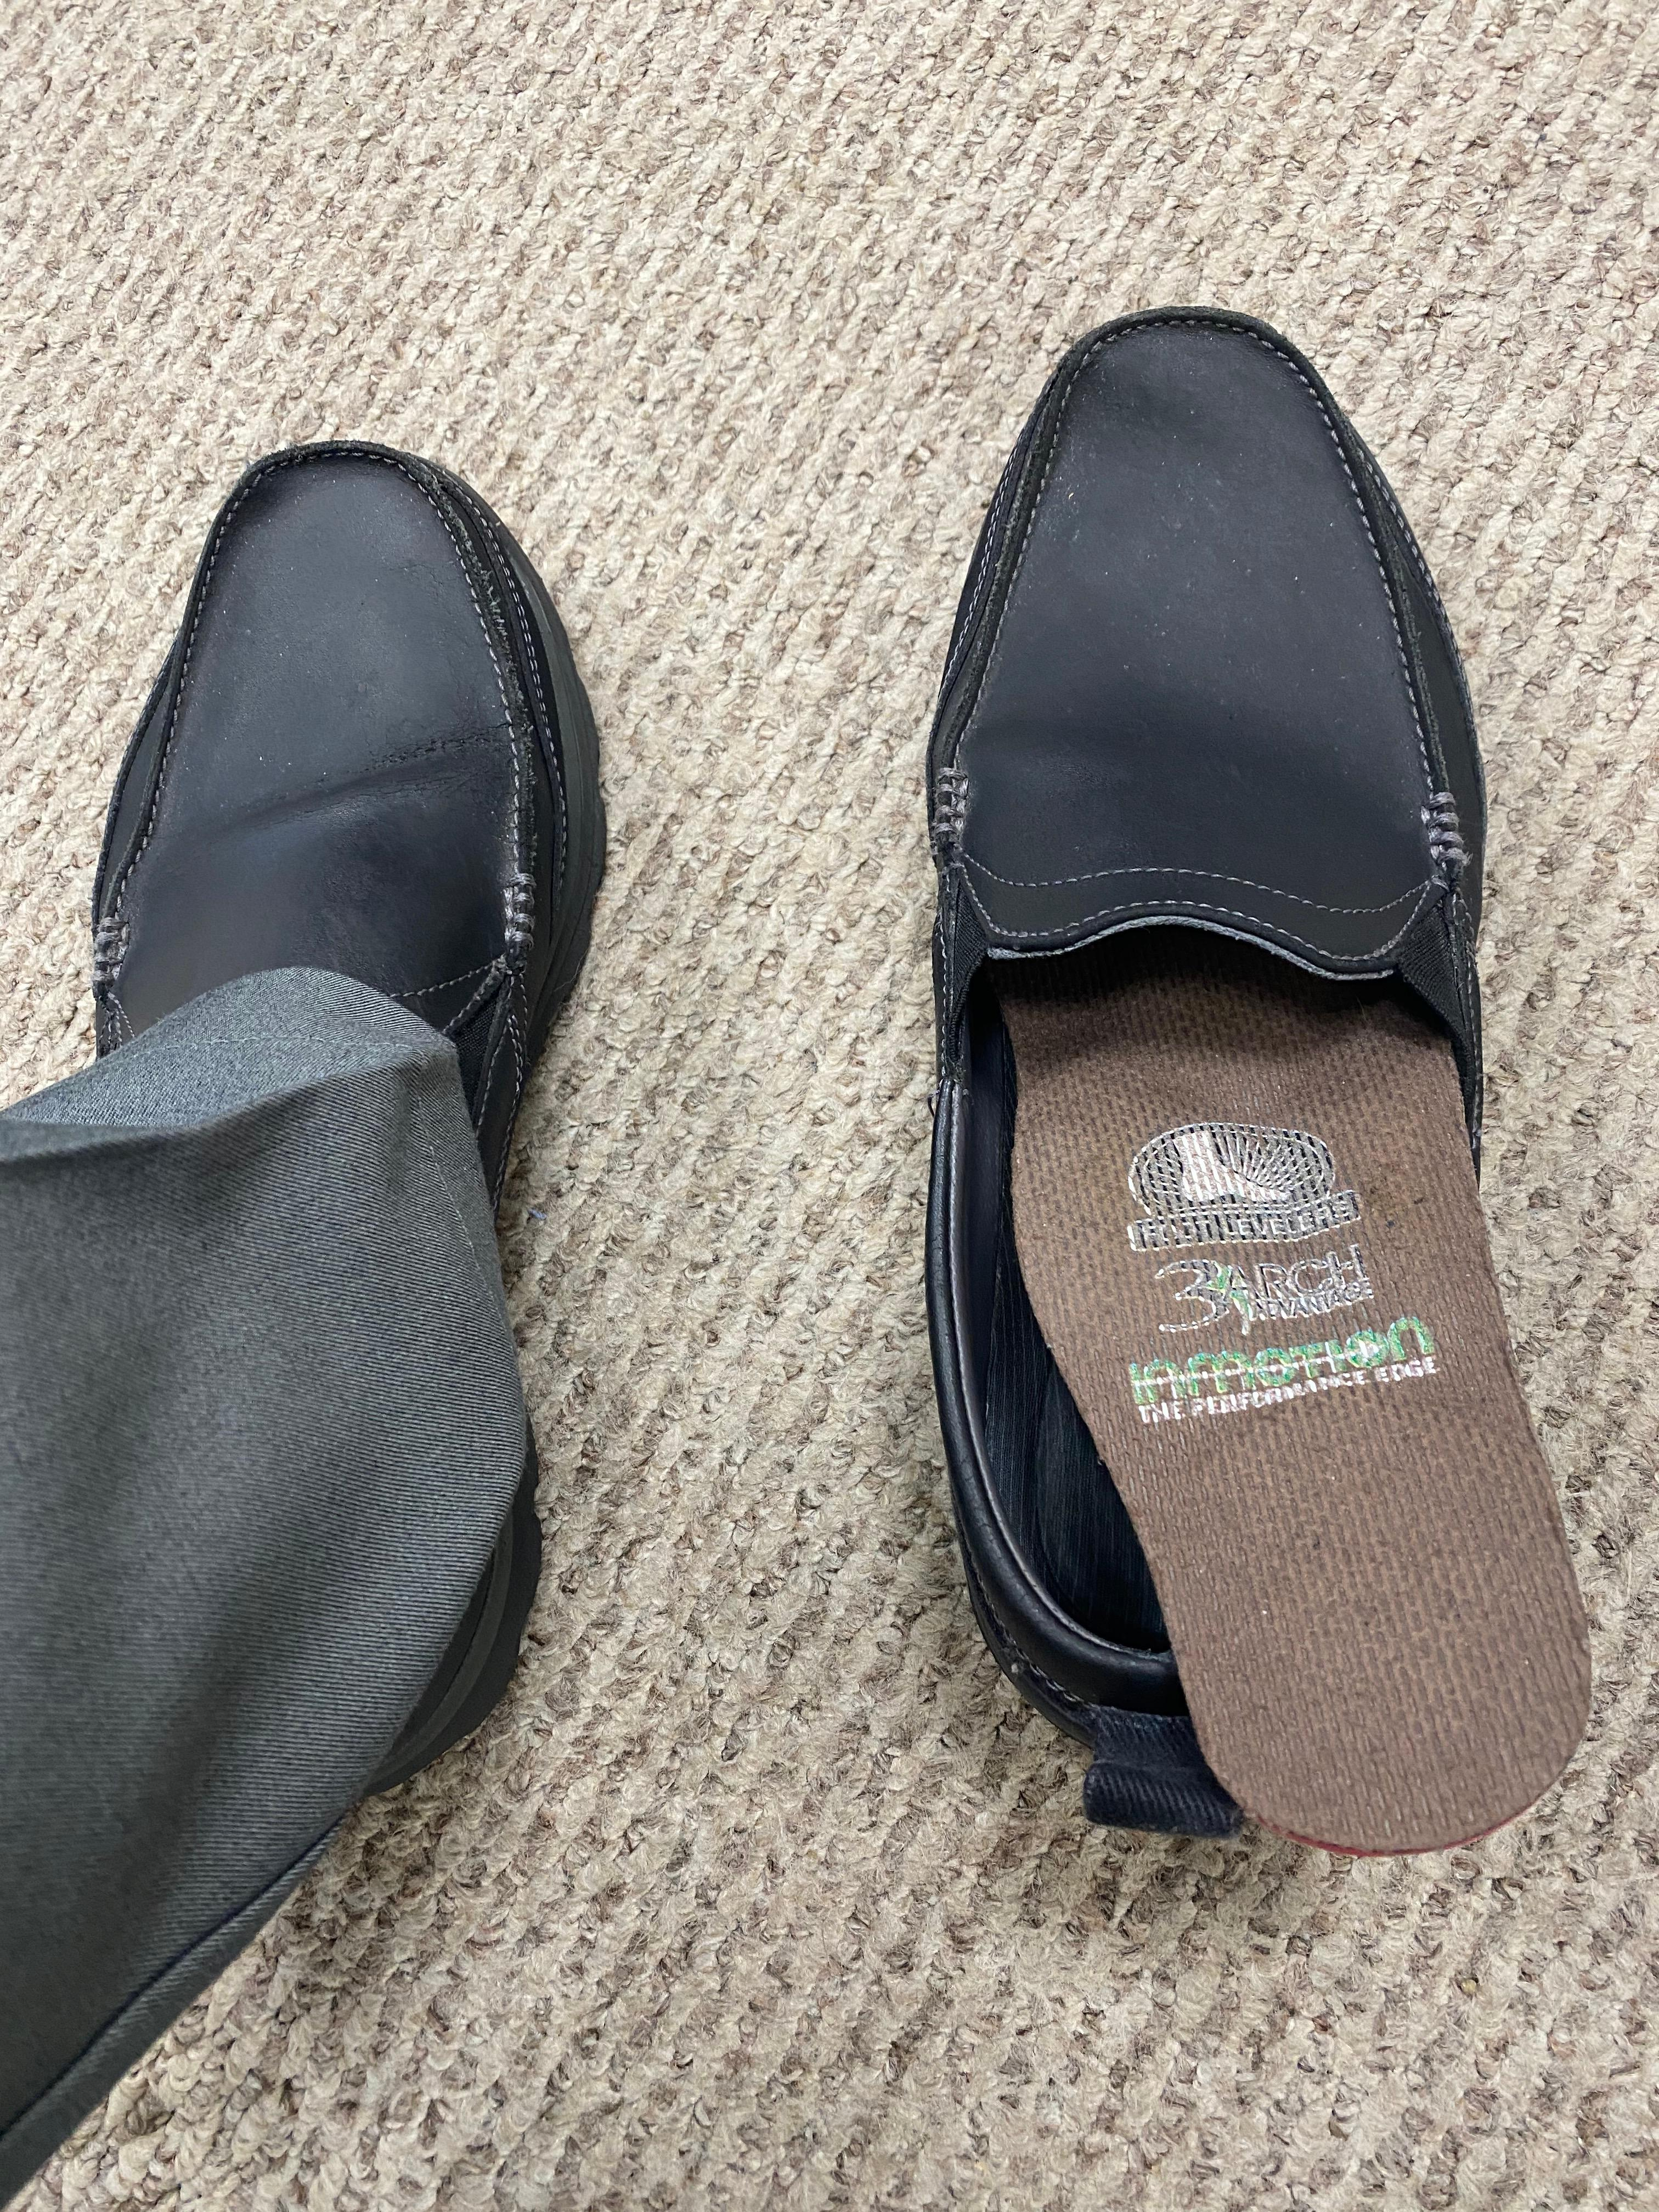 foot-levelers-orthotics